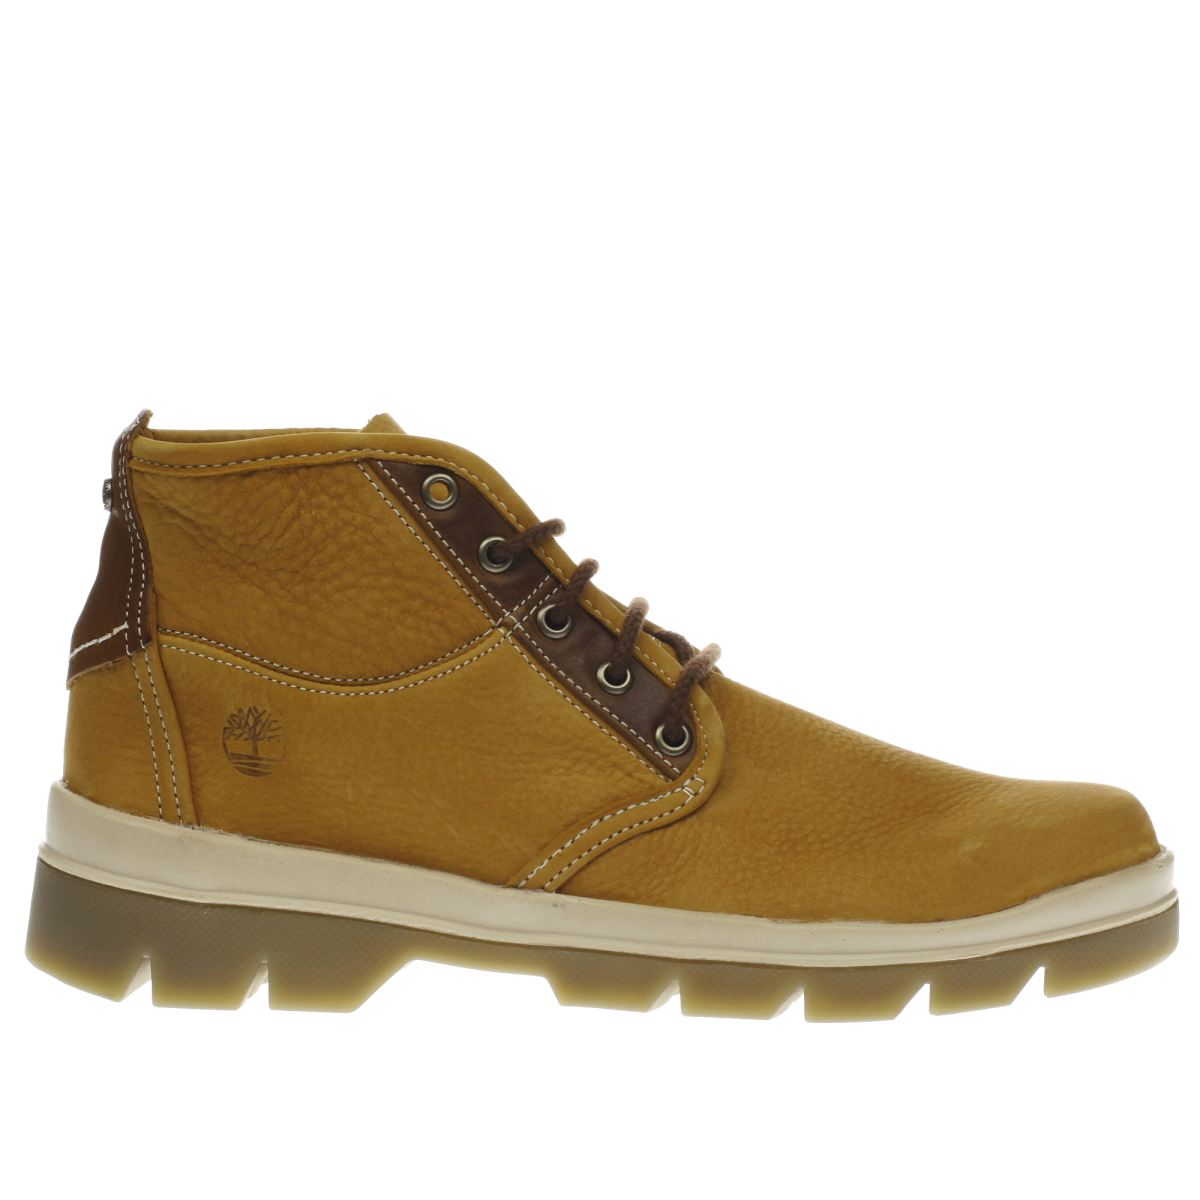 Timberland Tan Cityblazer Chukka Boots